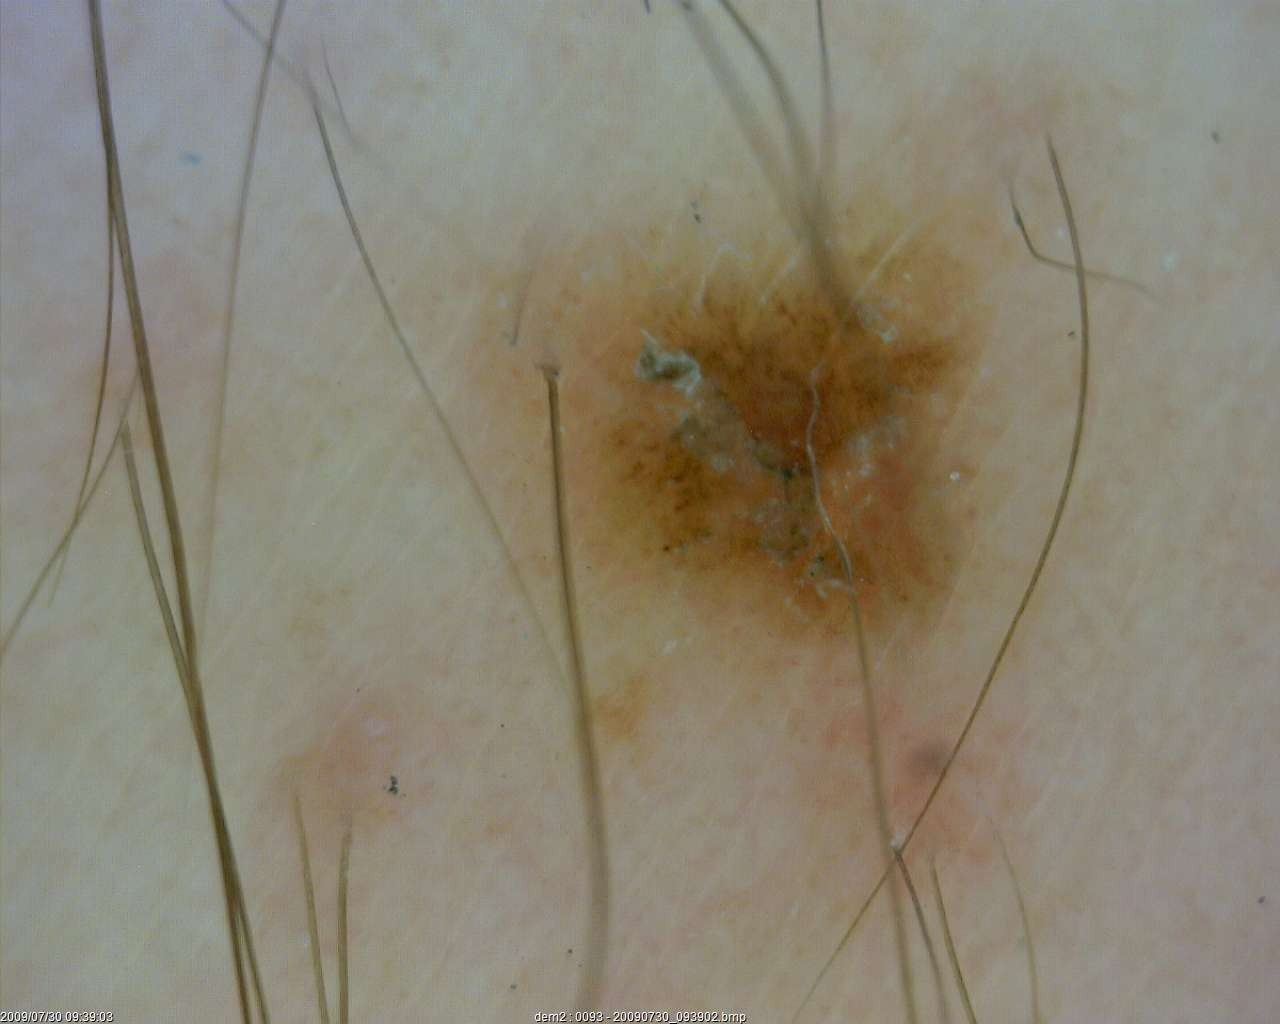 dermatology_11_1